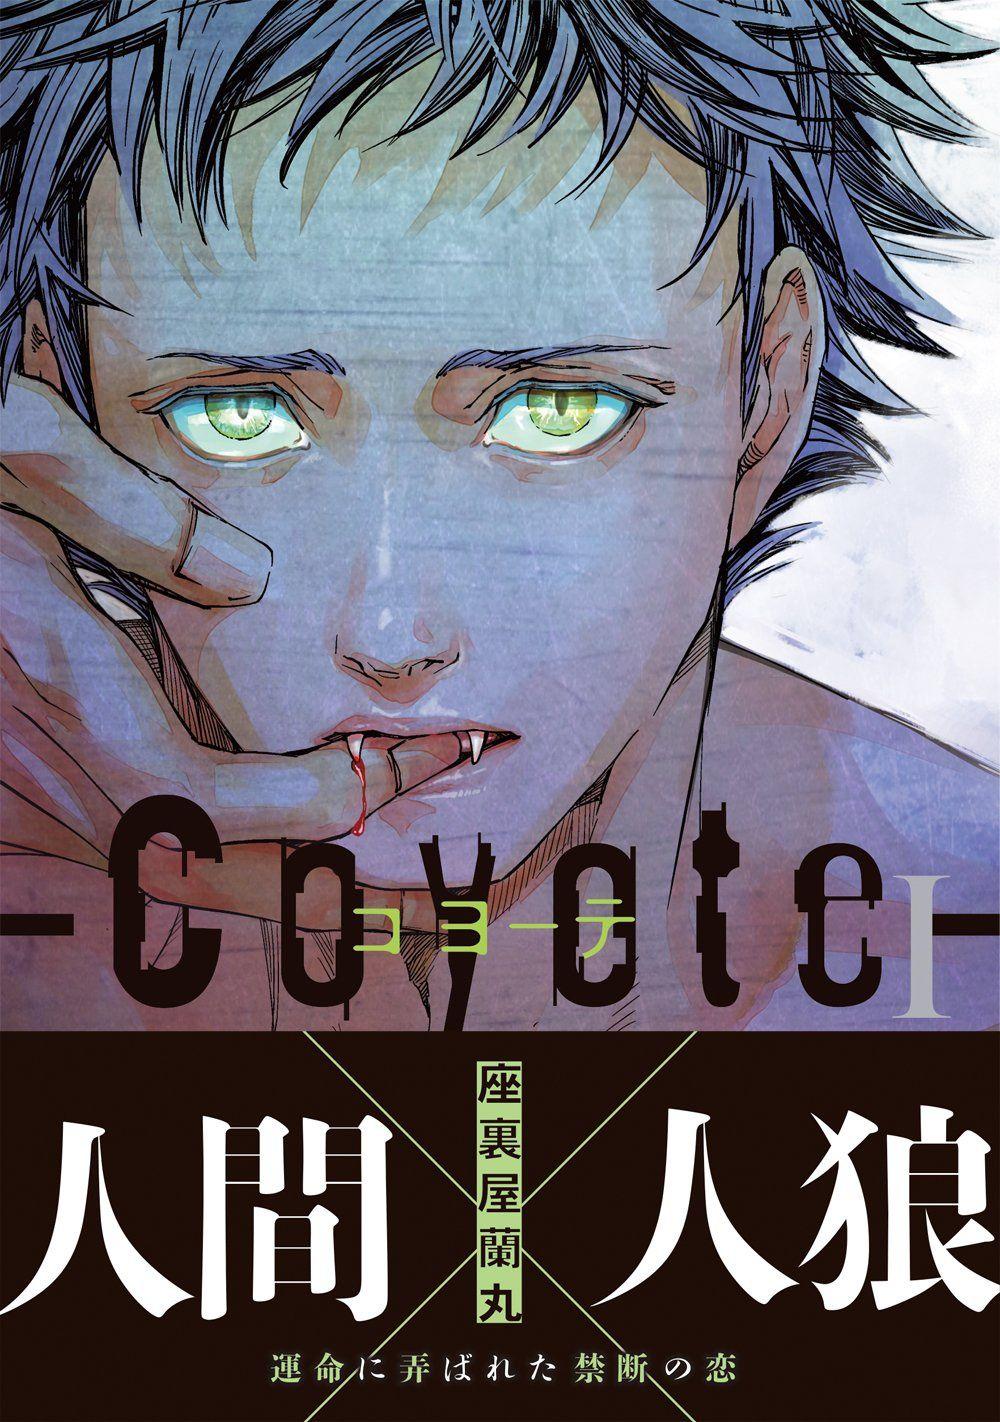 广播剧CD コヨーテI座裏屋蘭丸 小野友樹 興津和幸 卖萌 Zaria, Manga, Coyote